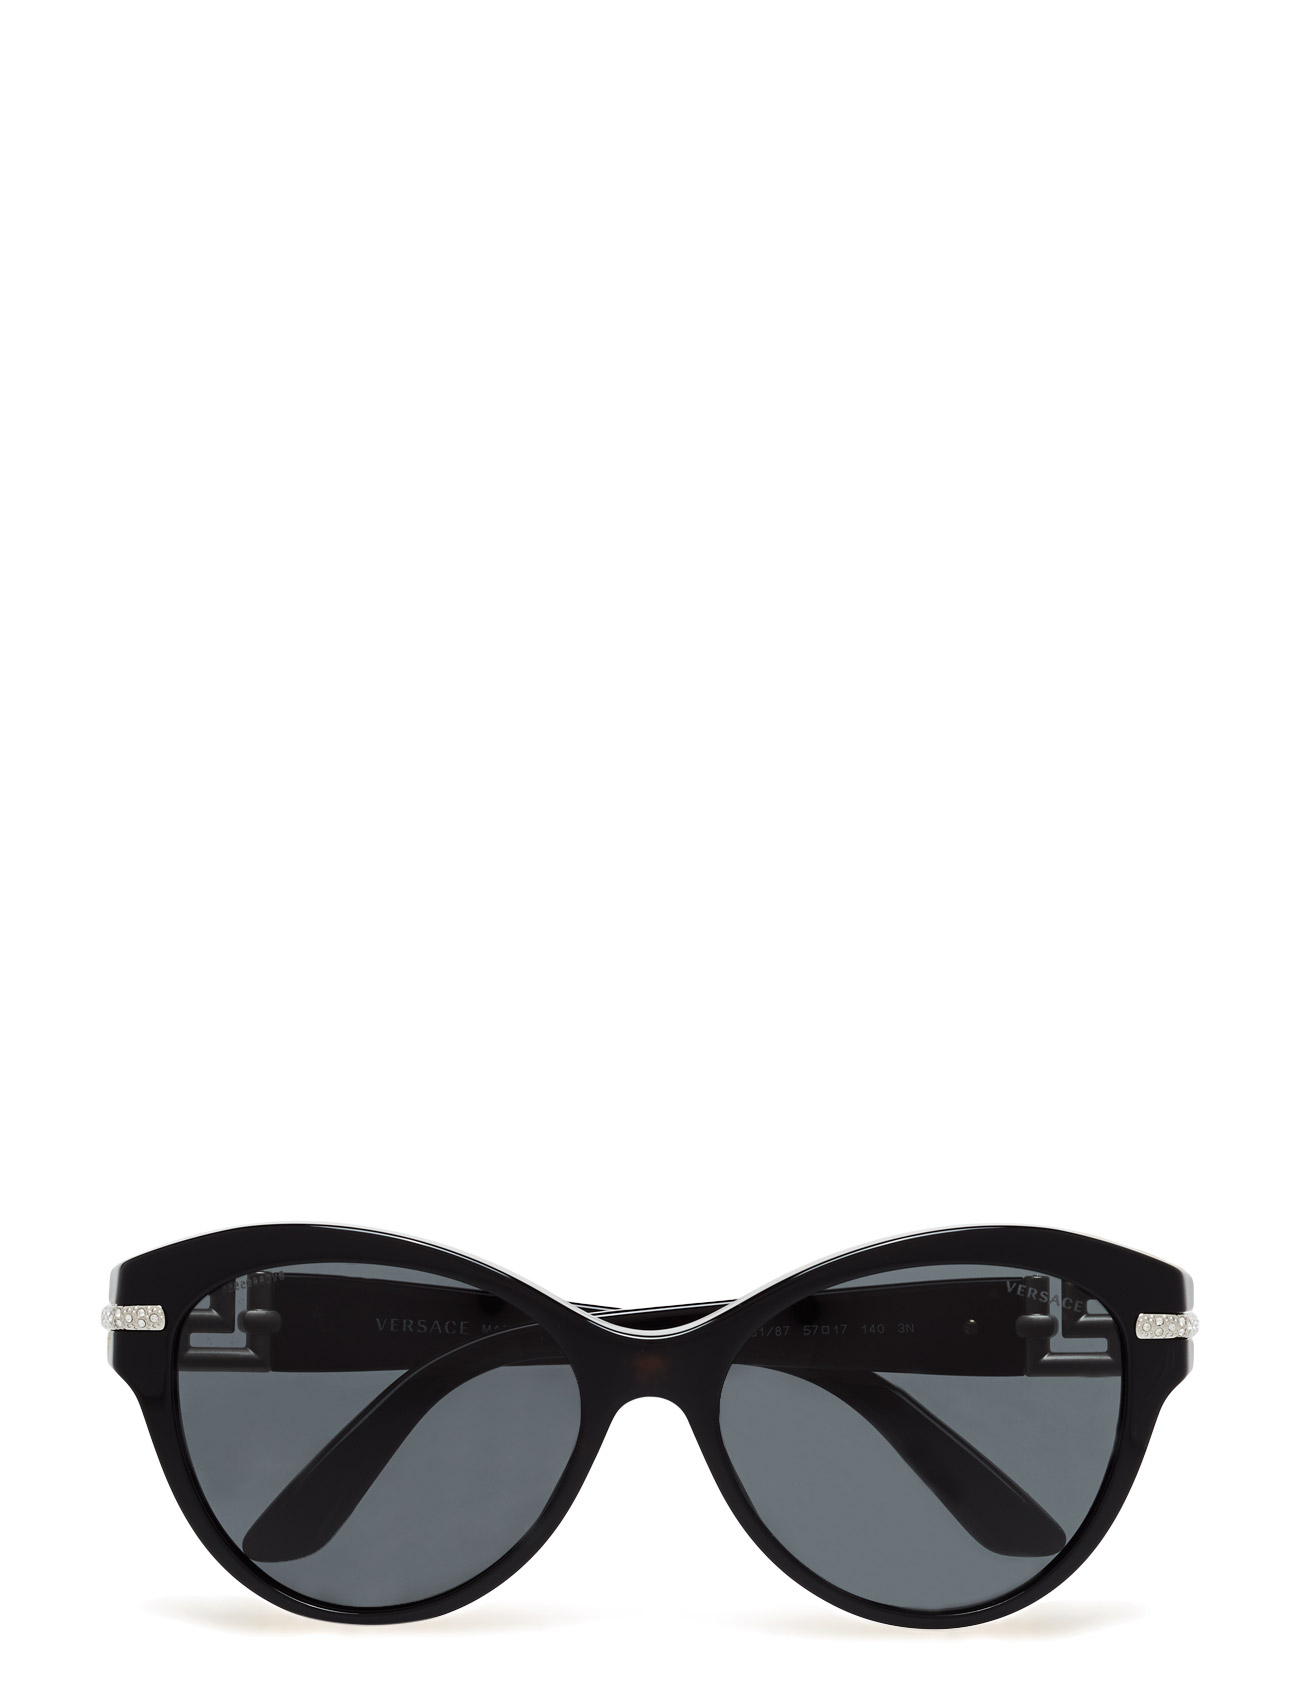 Rock icons | greca fra versace sunglasses fra boozt.com dk